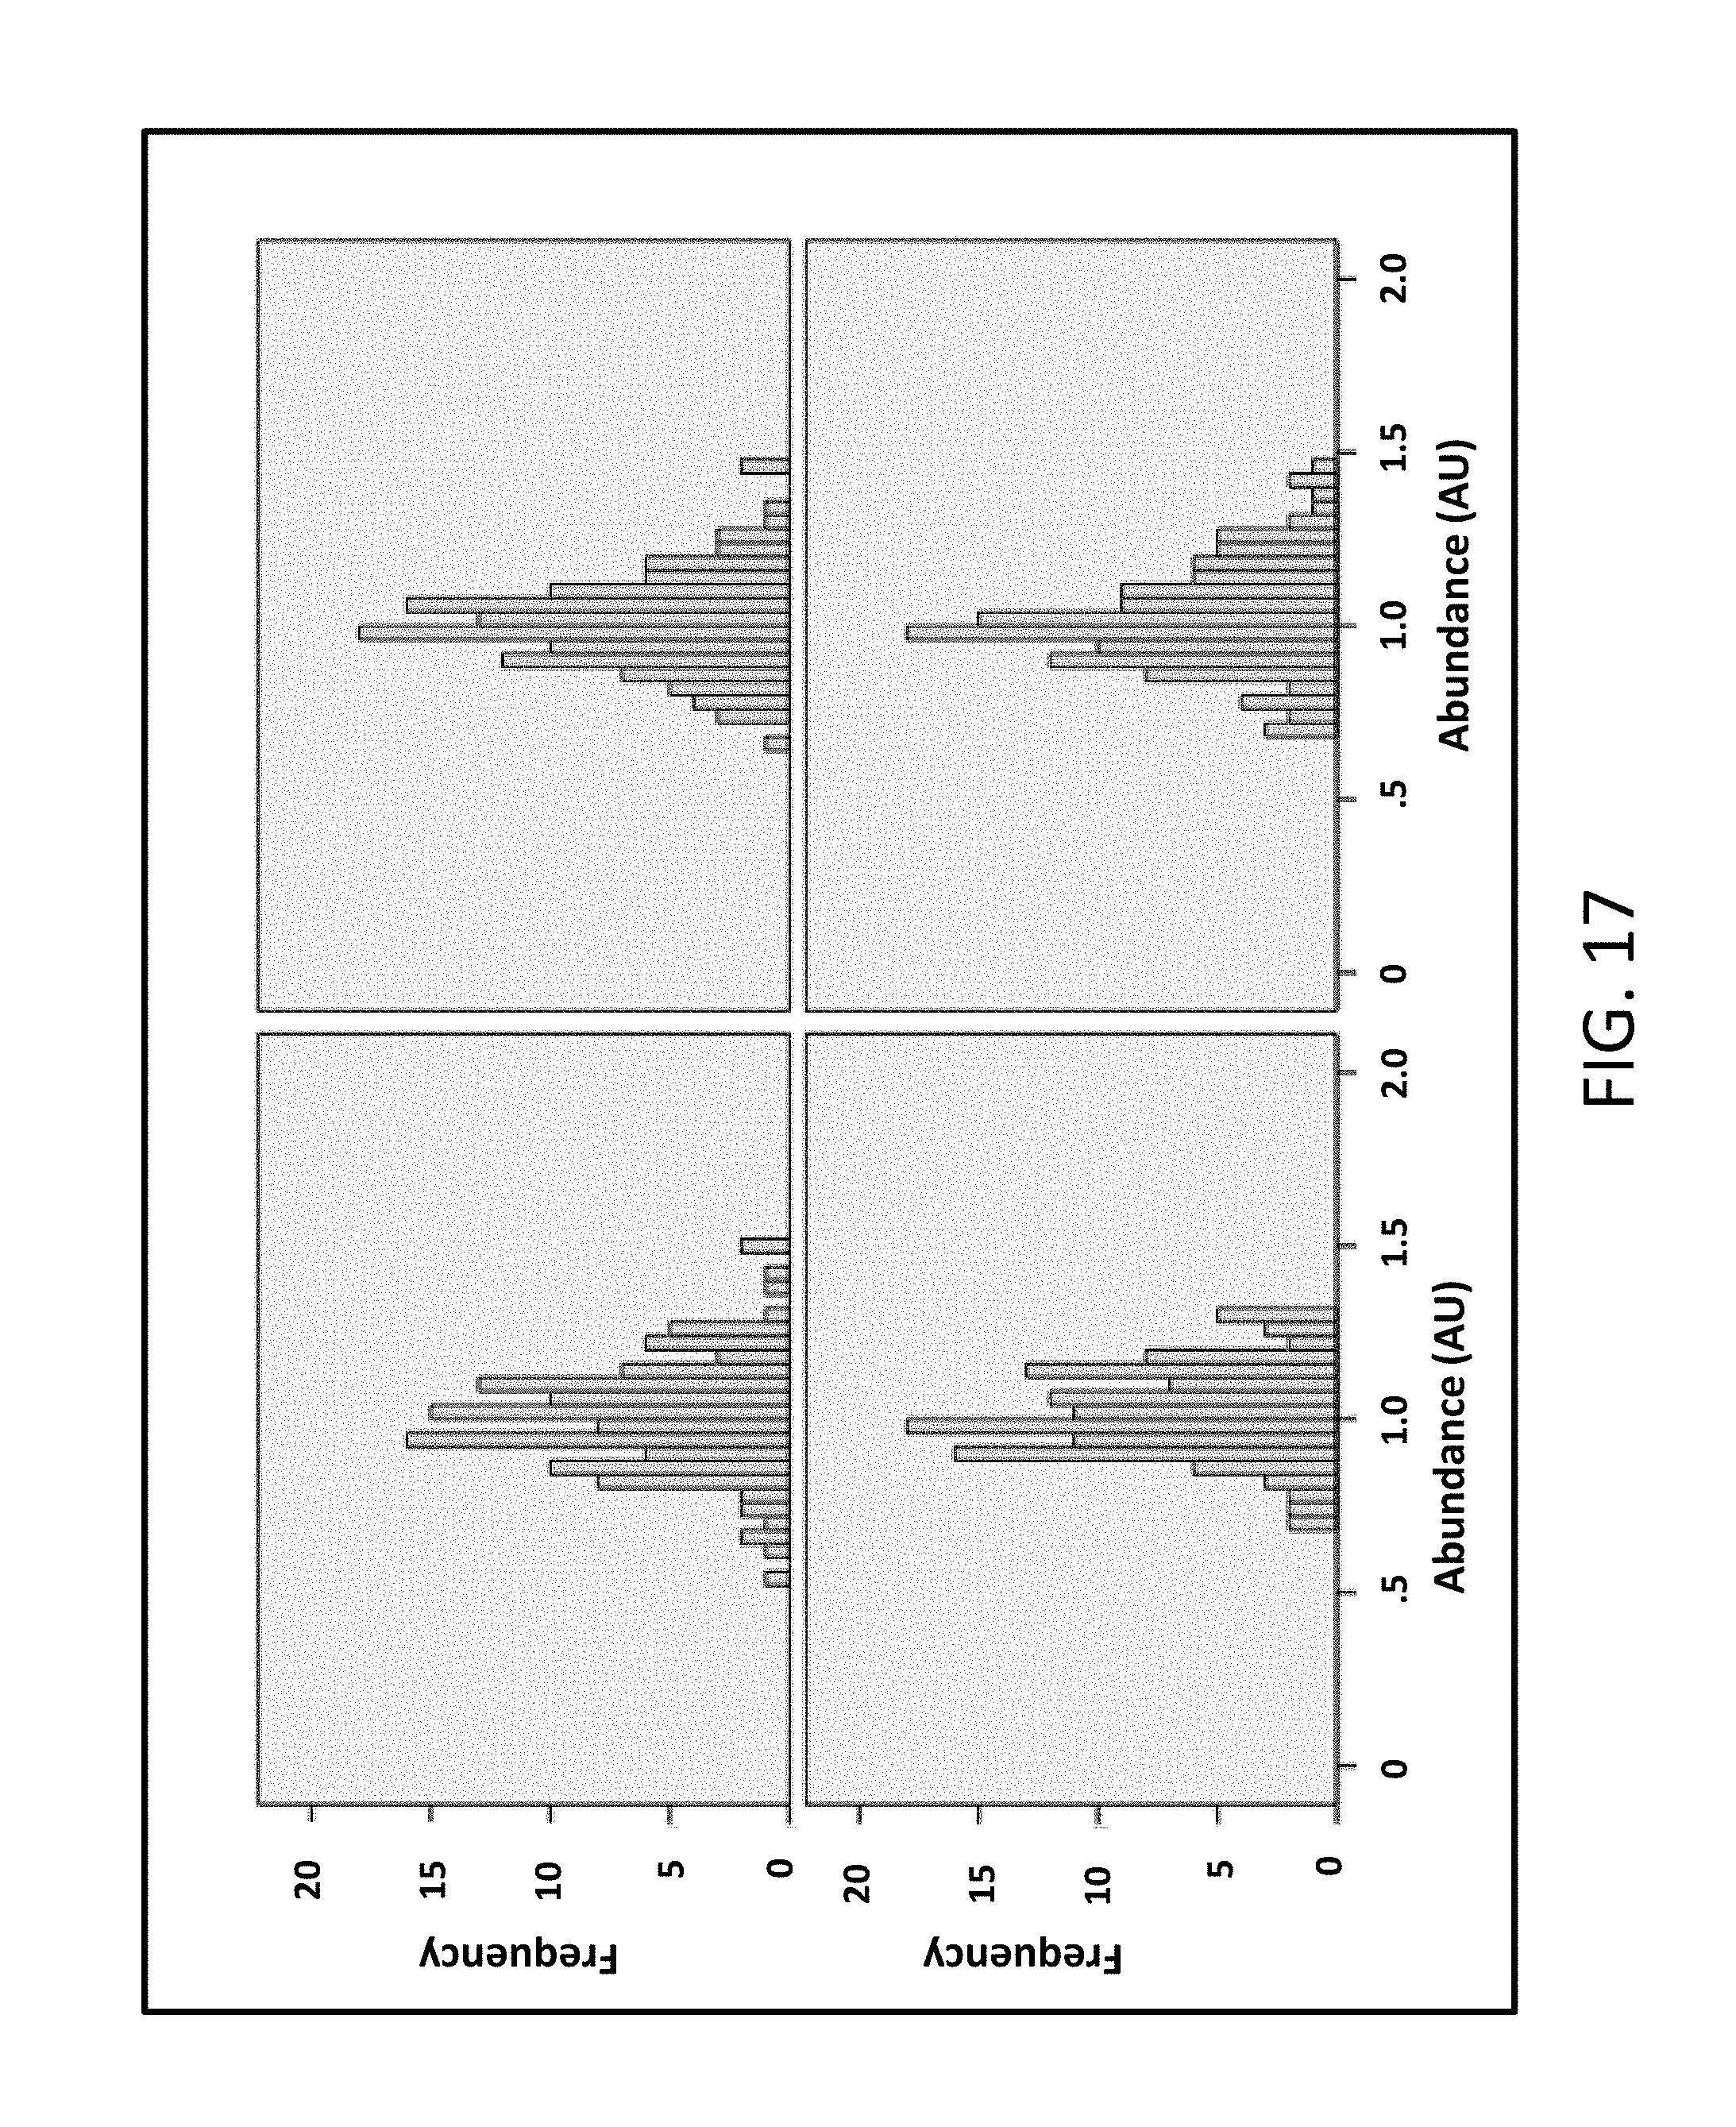 Patent US 10,053,688 B2